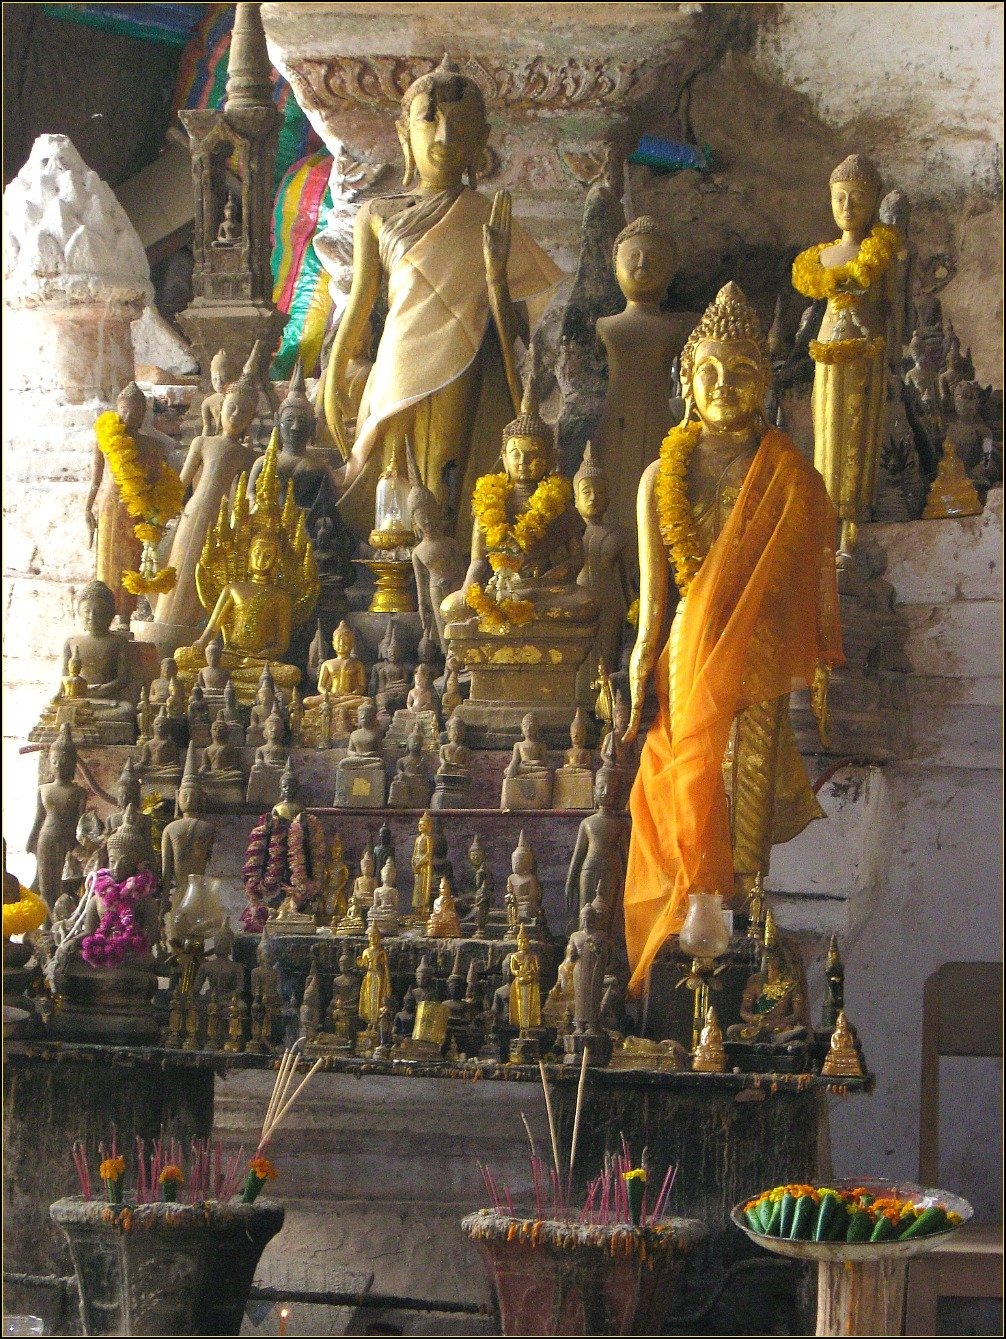 Buddha Statues Pak Ou Caves Mekong River